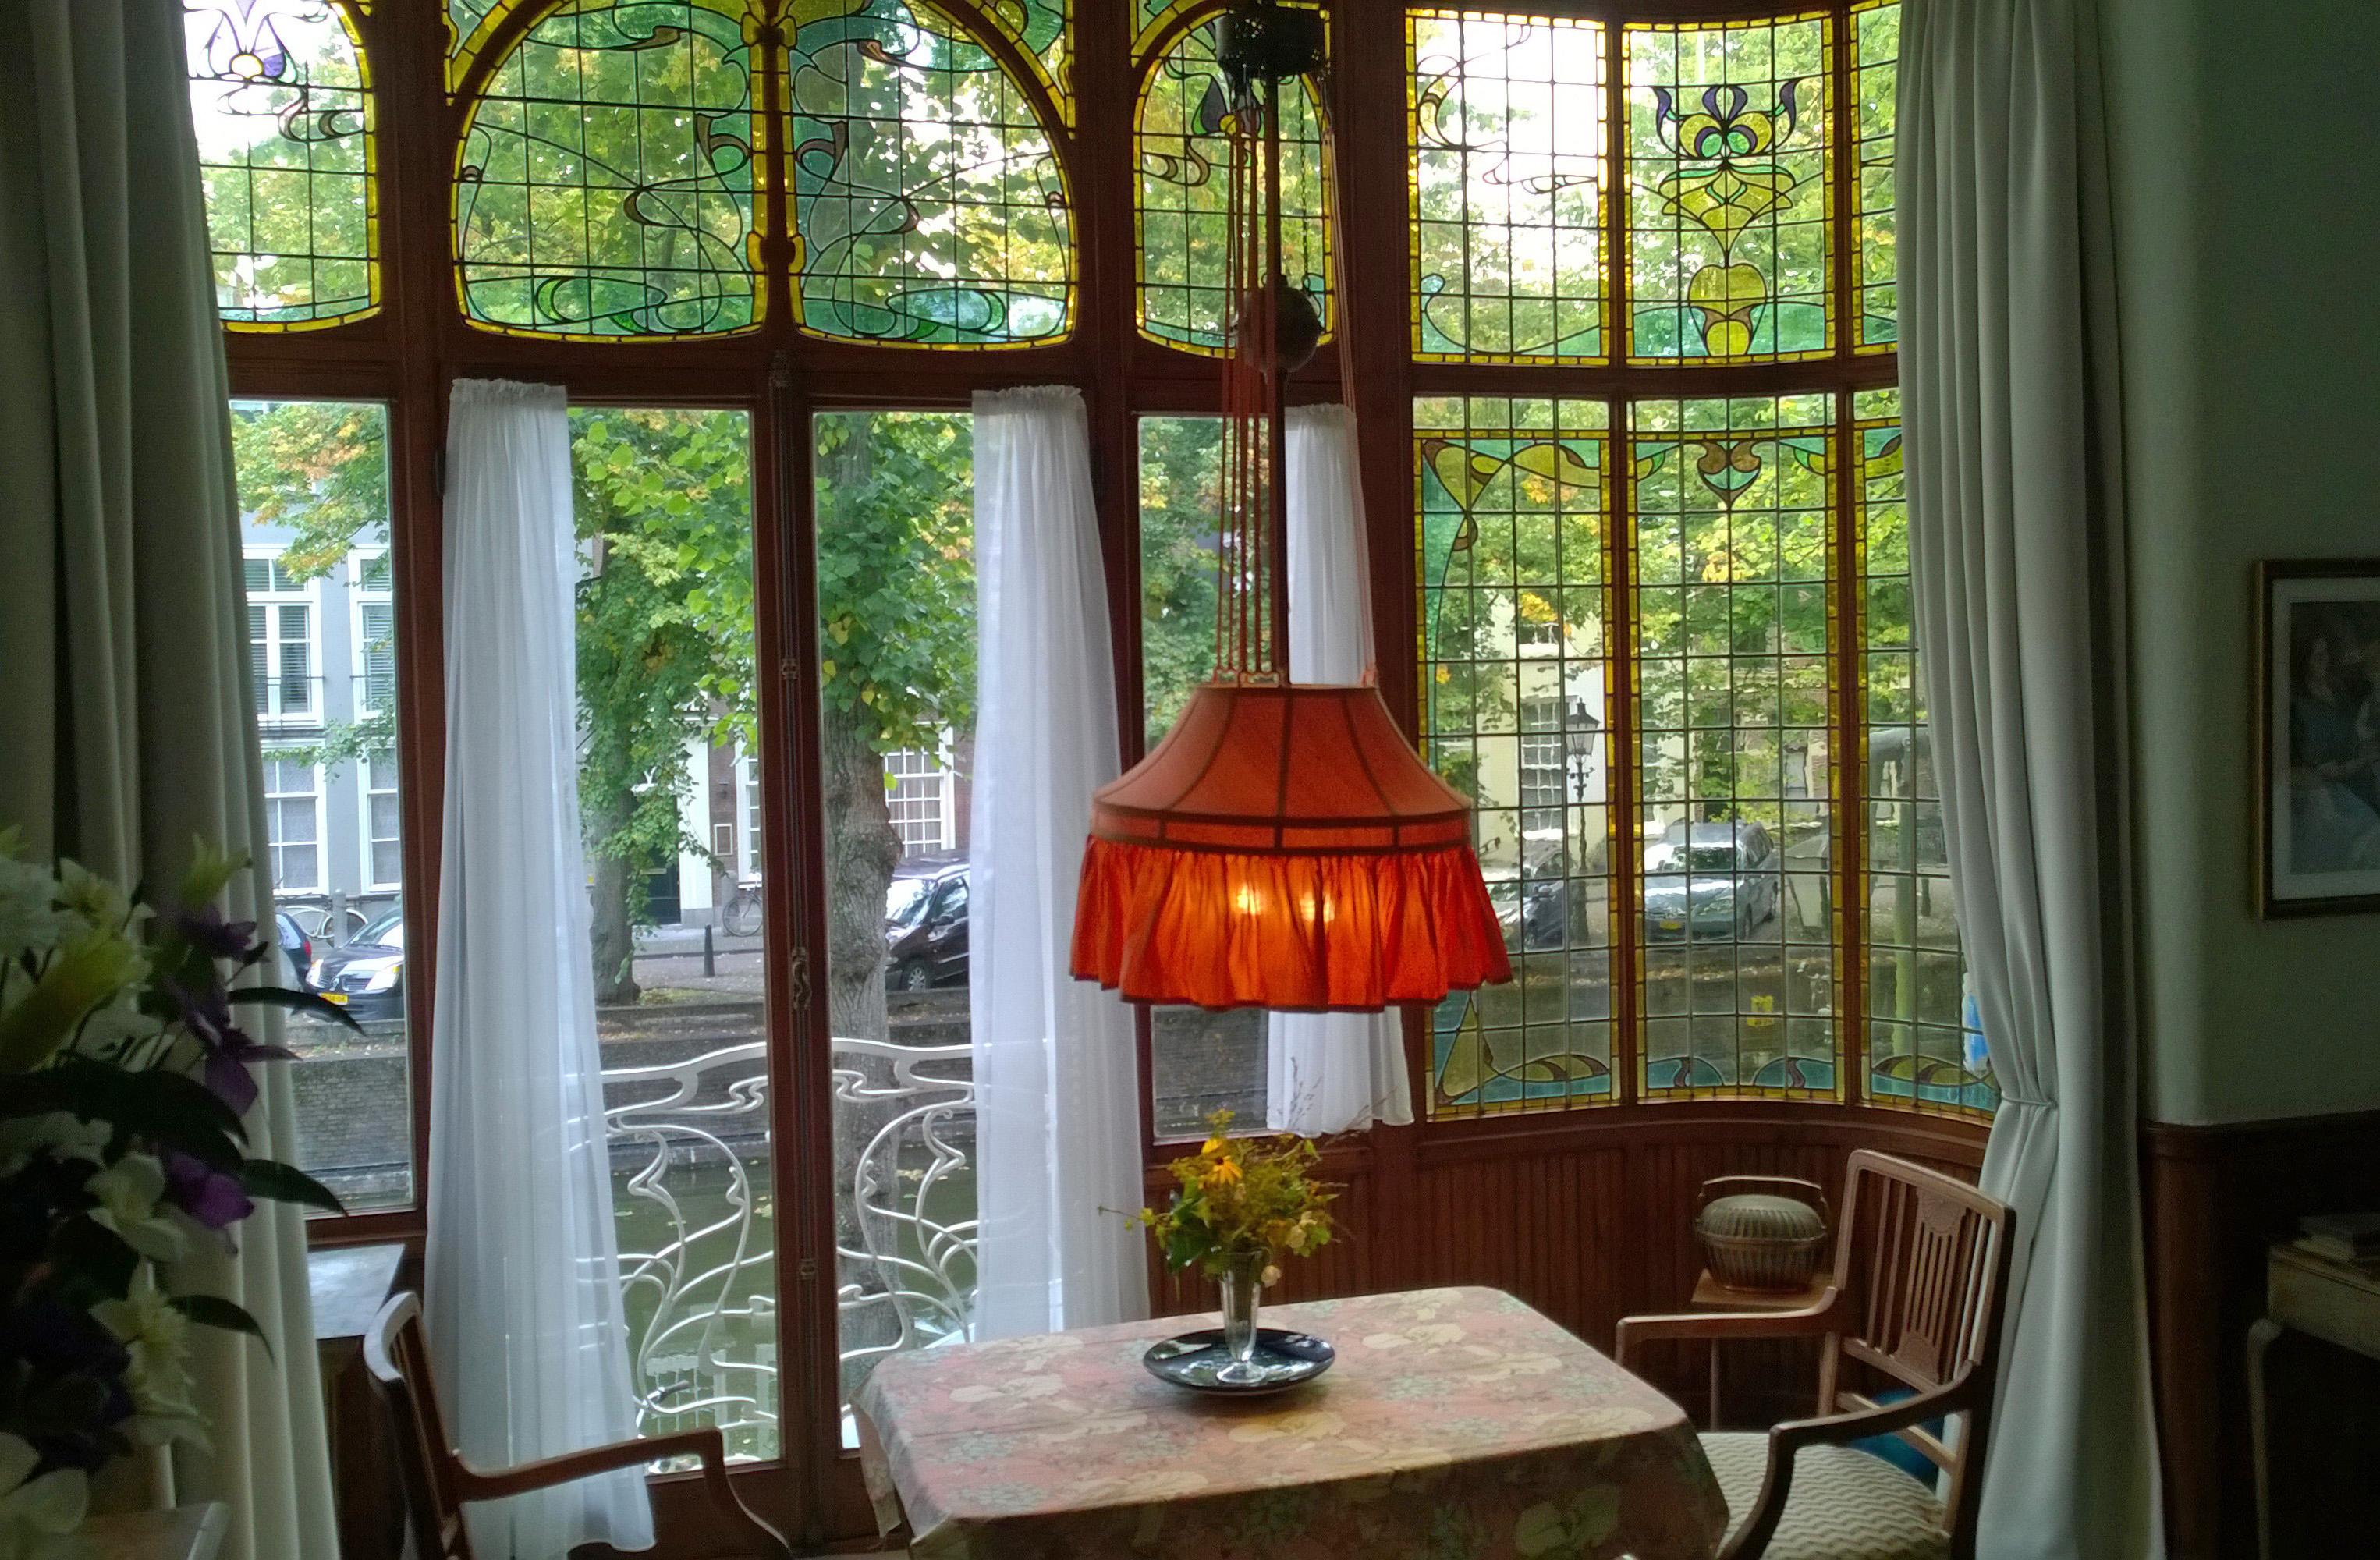 Lorrie huis smidswater 26 den haag interieur woonkamer anno1900 - Interieur van huis ...